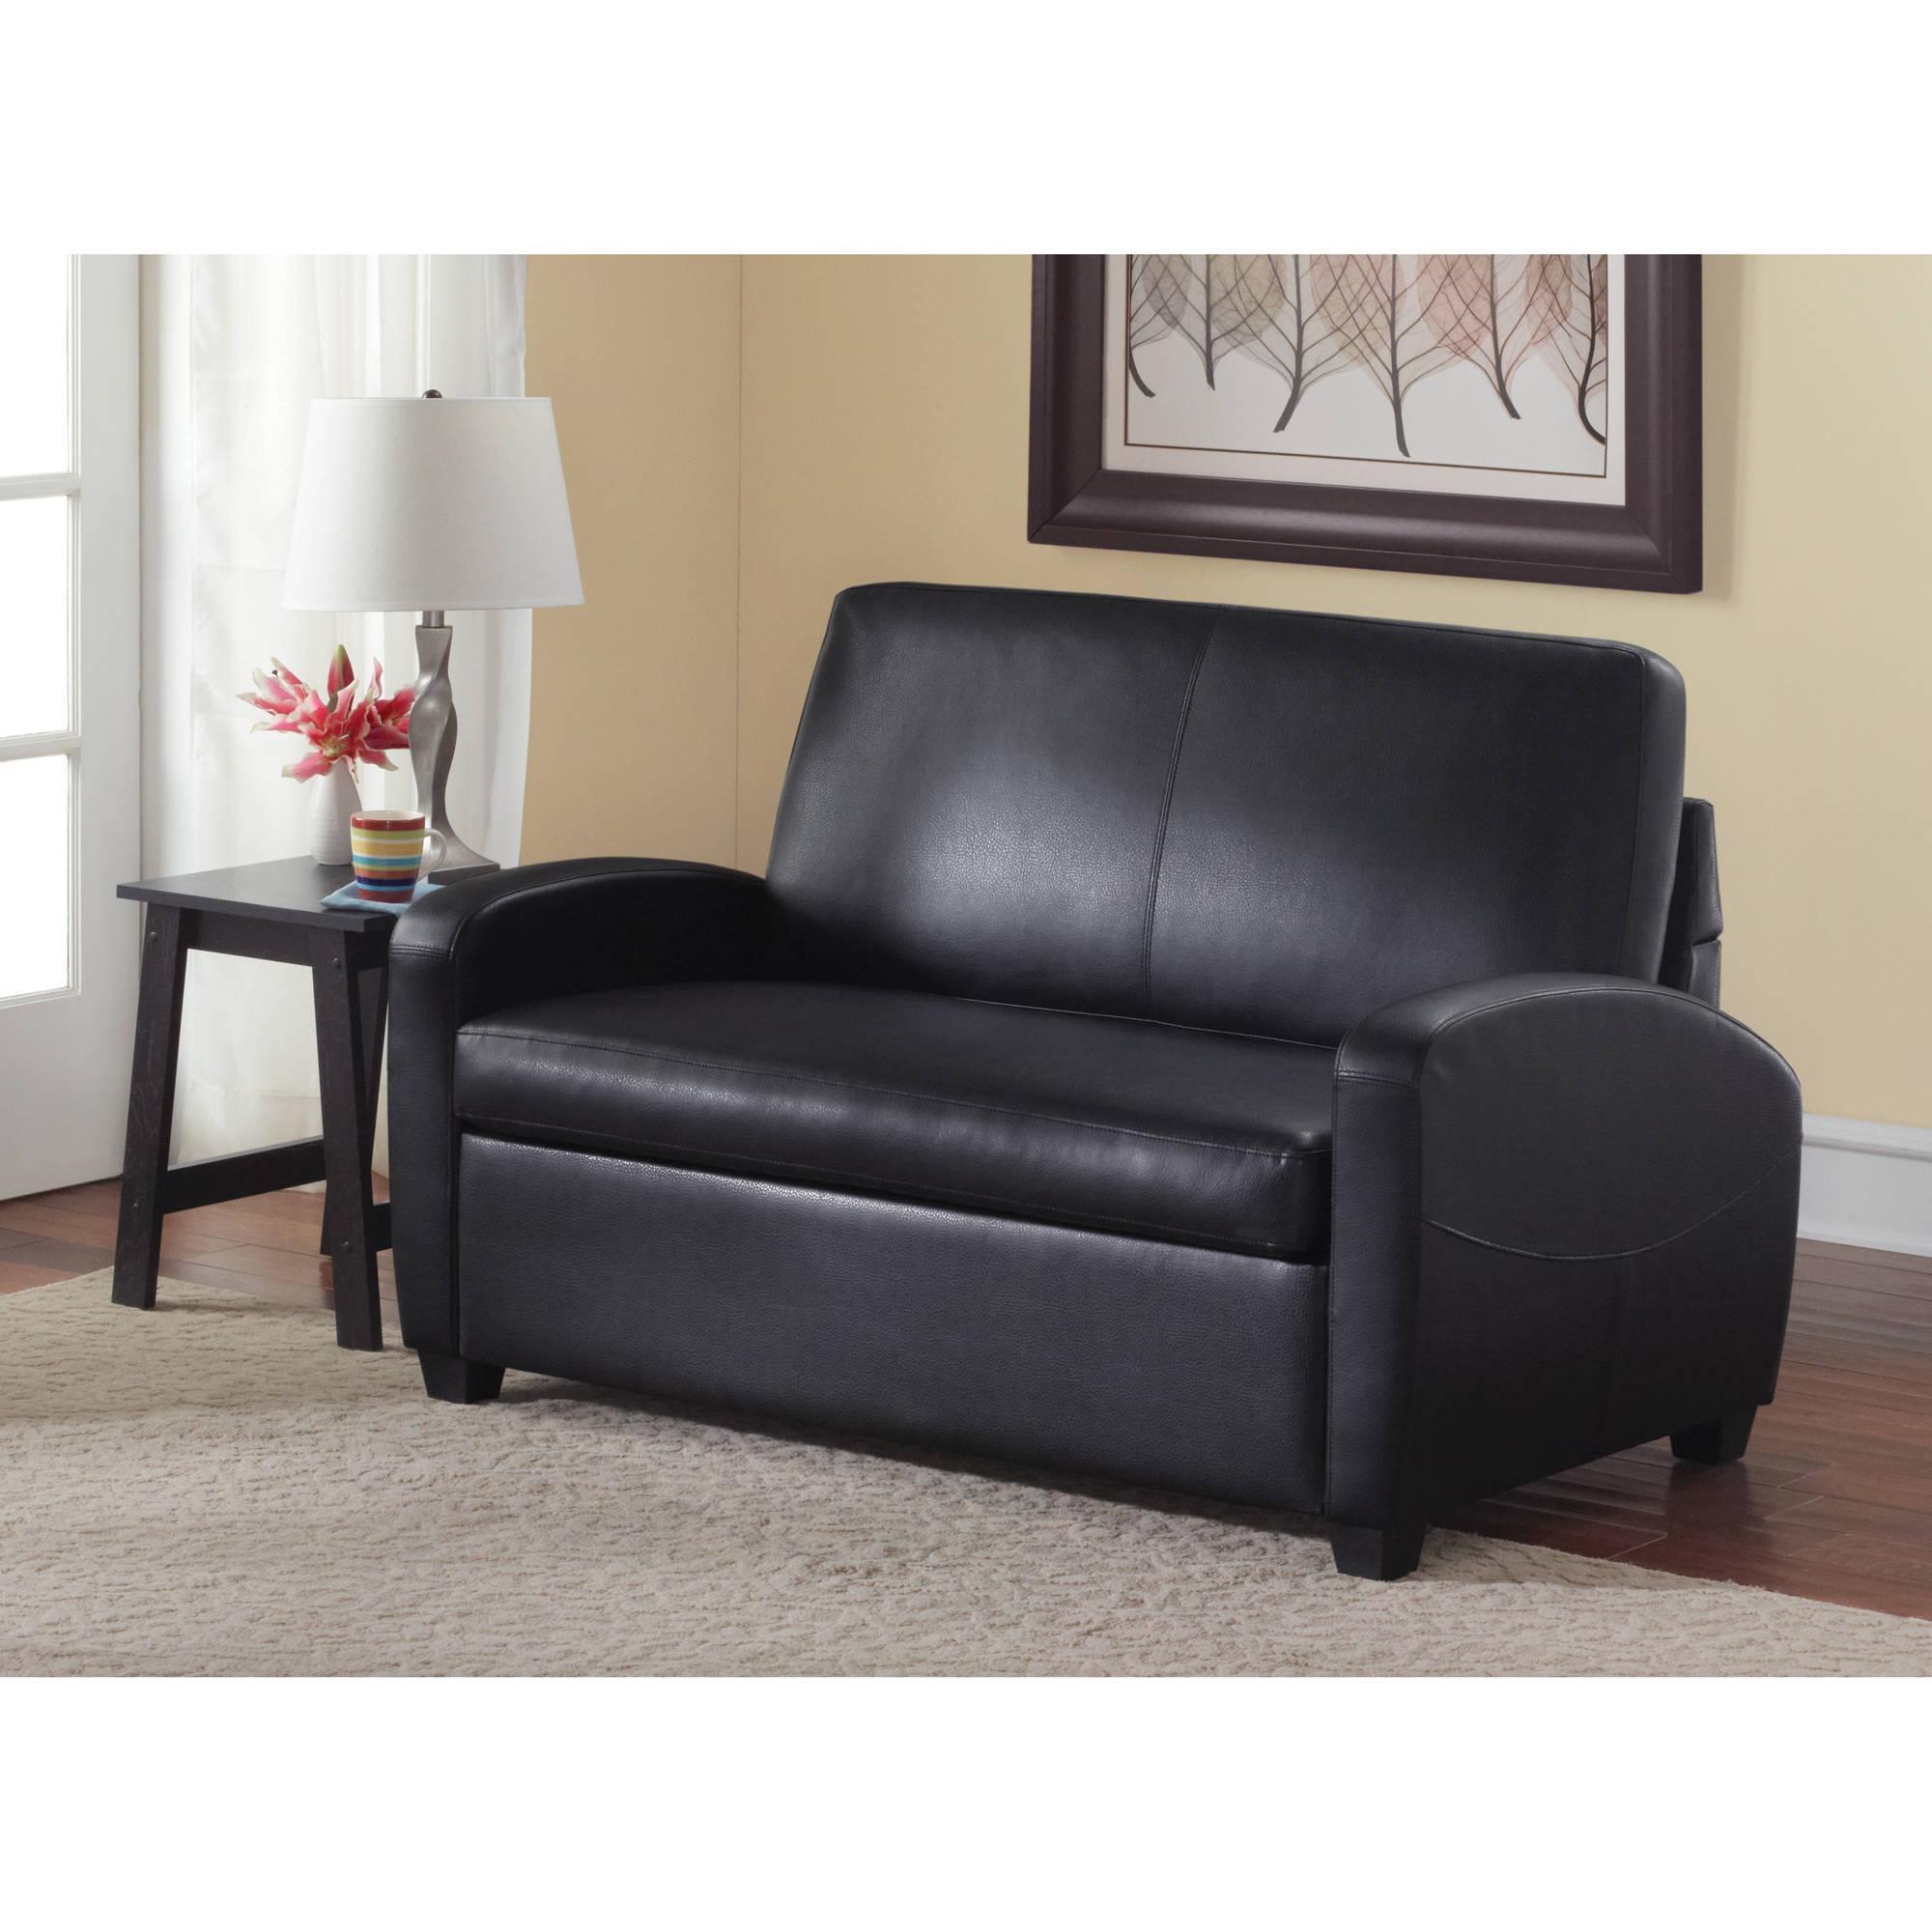 sleeper sofa black best quality futon bed 20 top mainstays sofas ideas